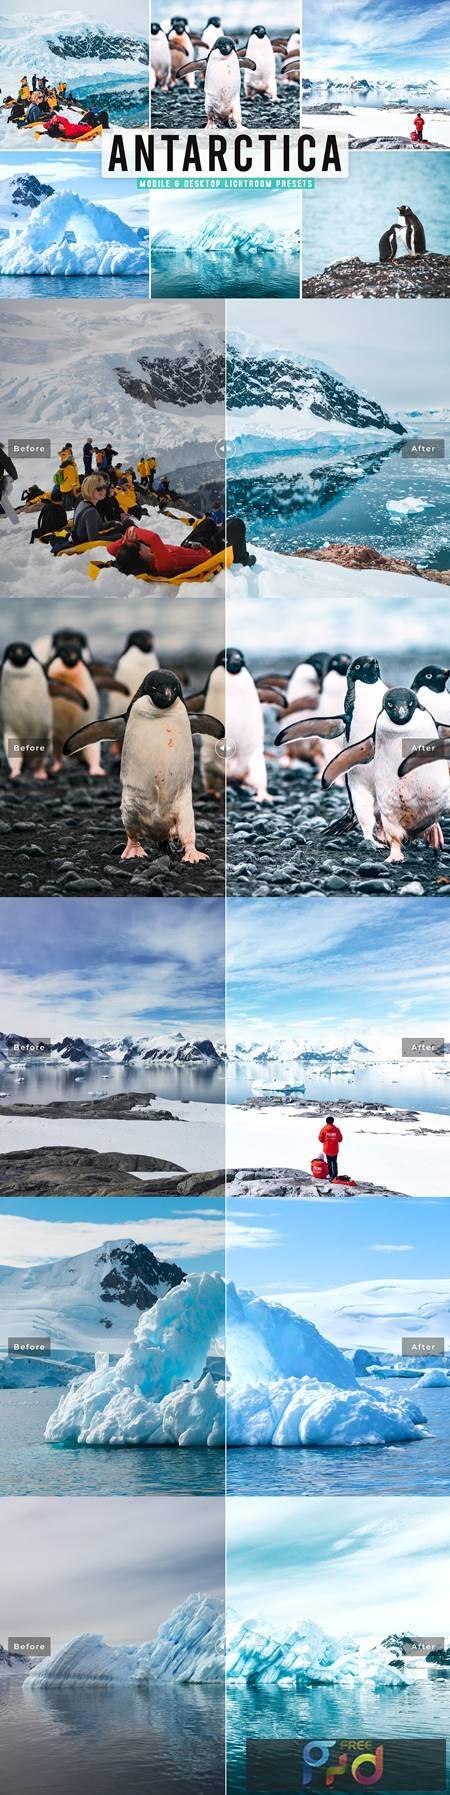 Antarctica Pro Lightroom Presets 5495663 1